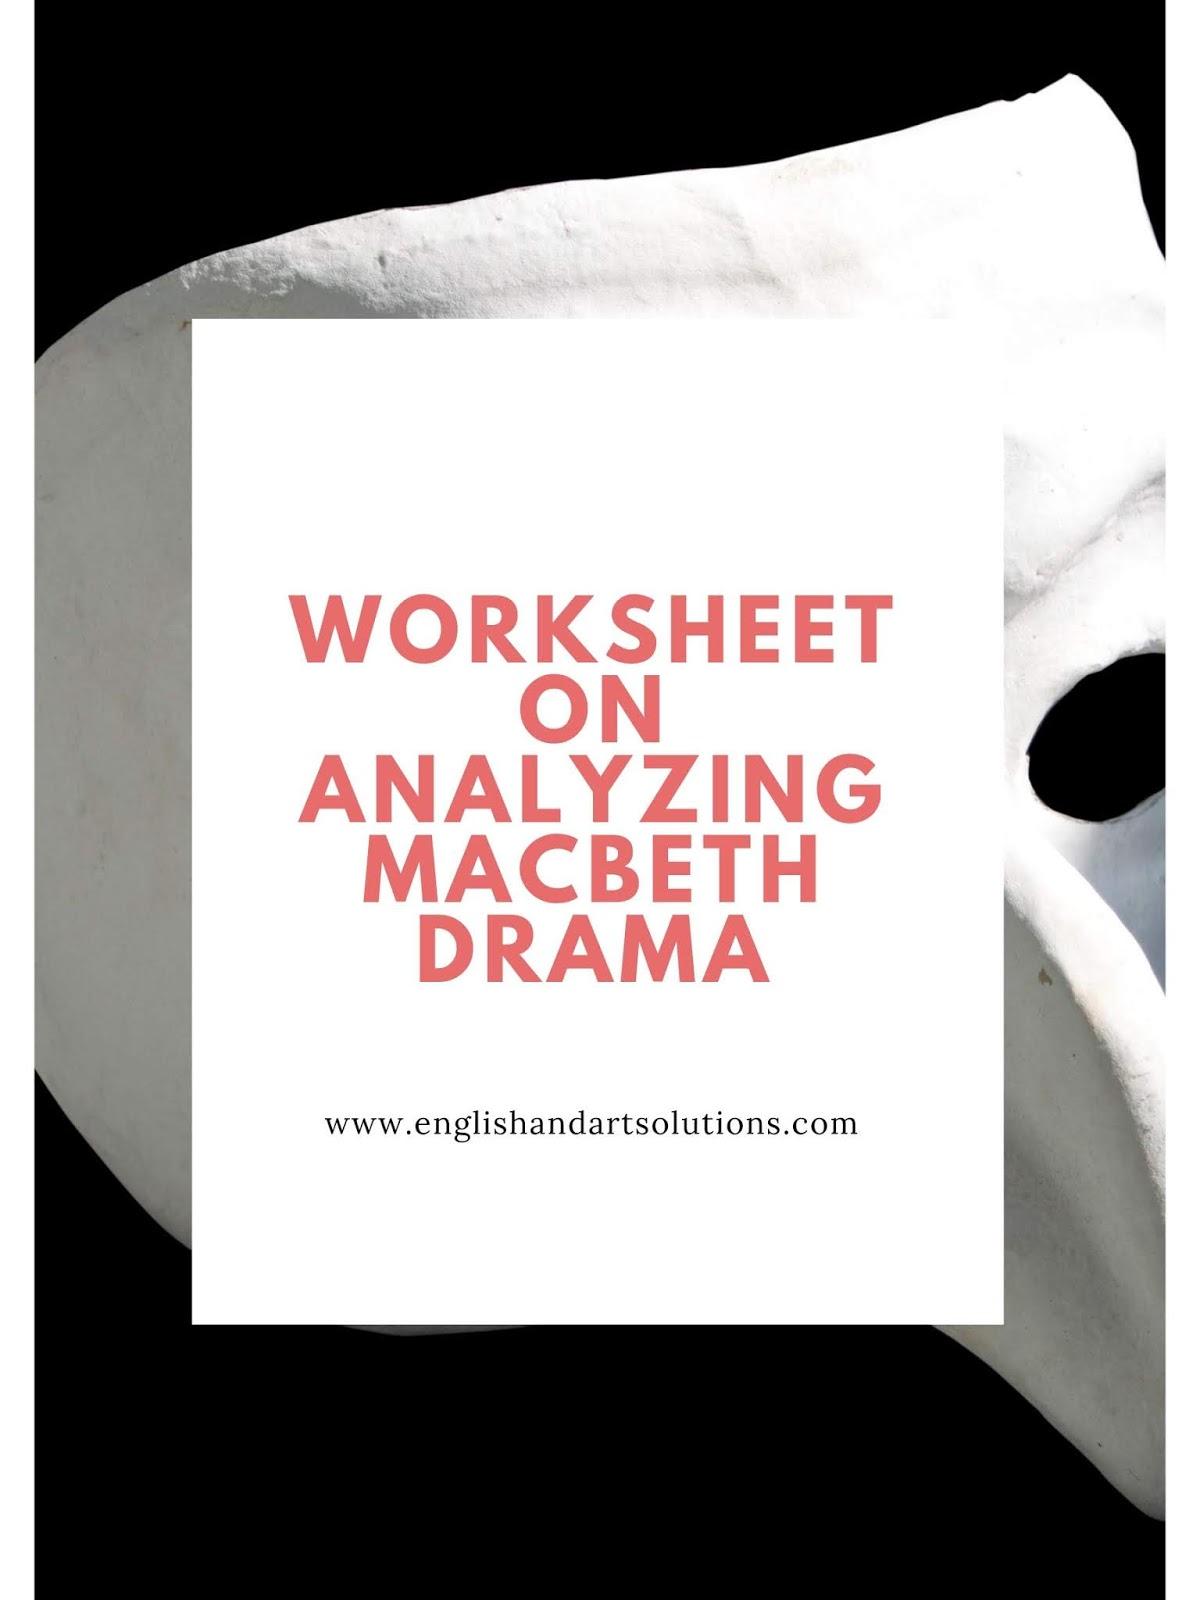 English And Art Solutions Worksheet Onyzing Macbeth